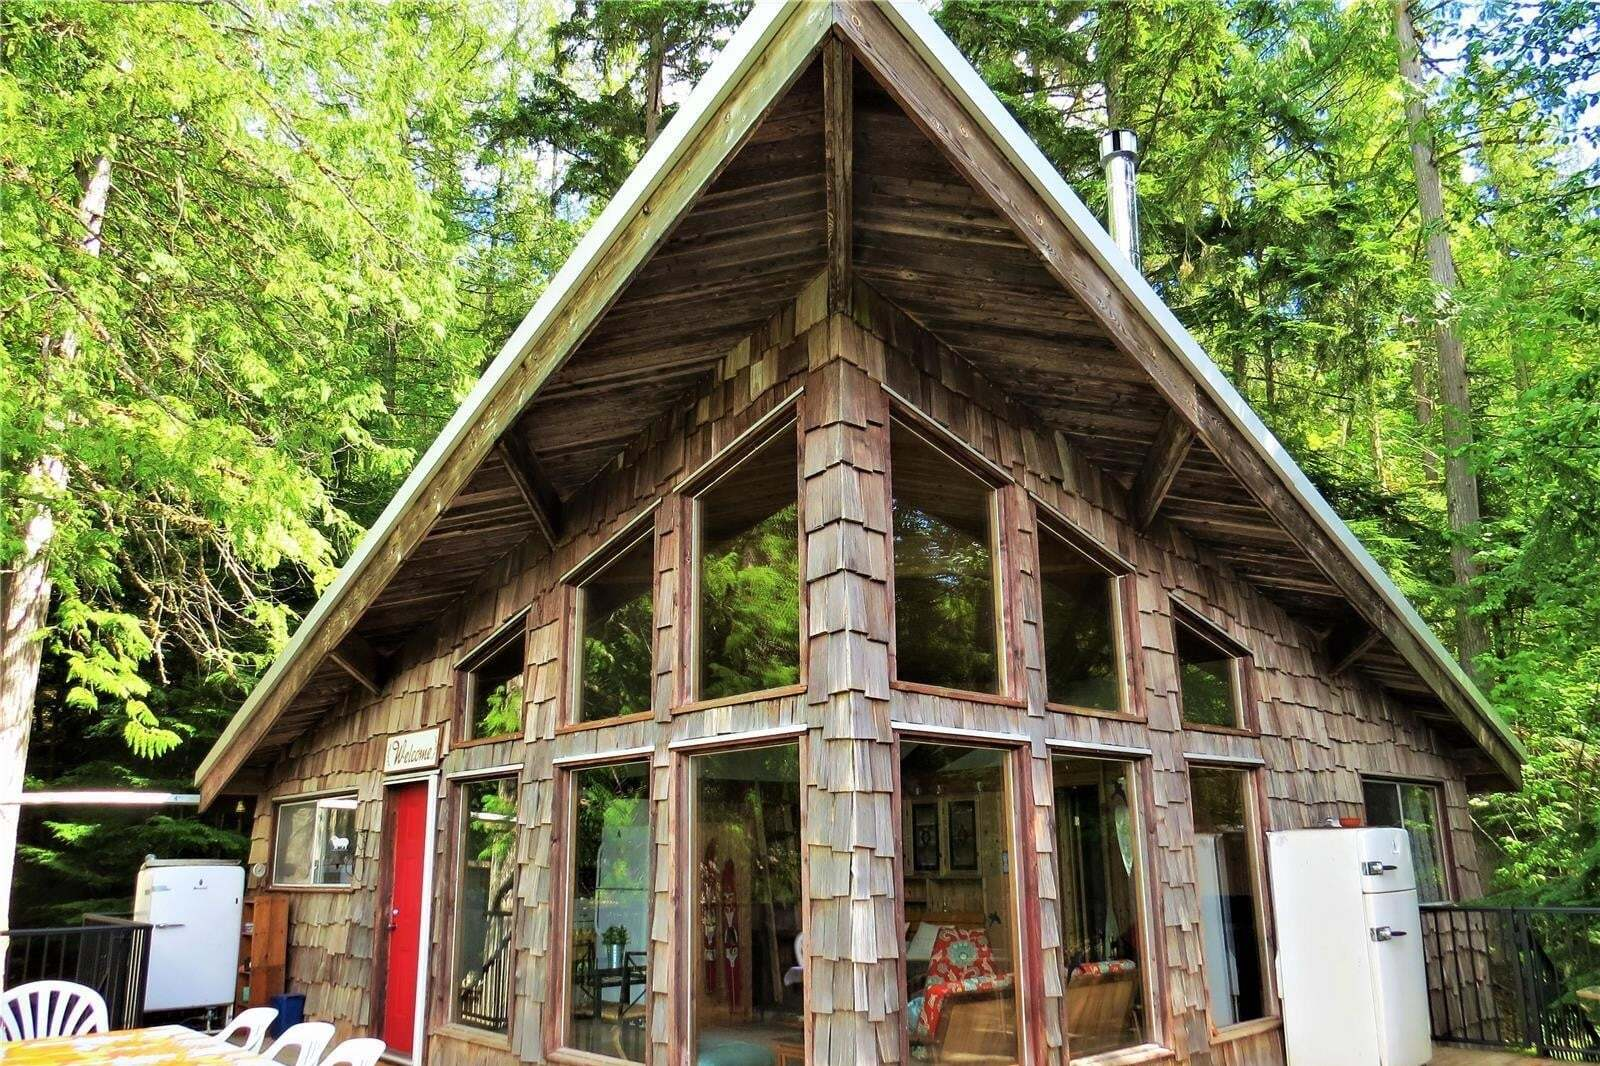 House for sale at 7265 900 Fsr (kalli Bay) Rd Eagle Bay British Columbia - MLS: 10205595